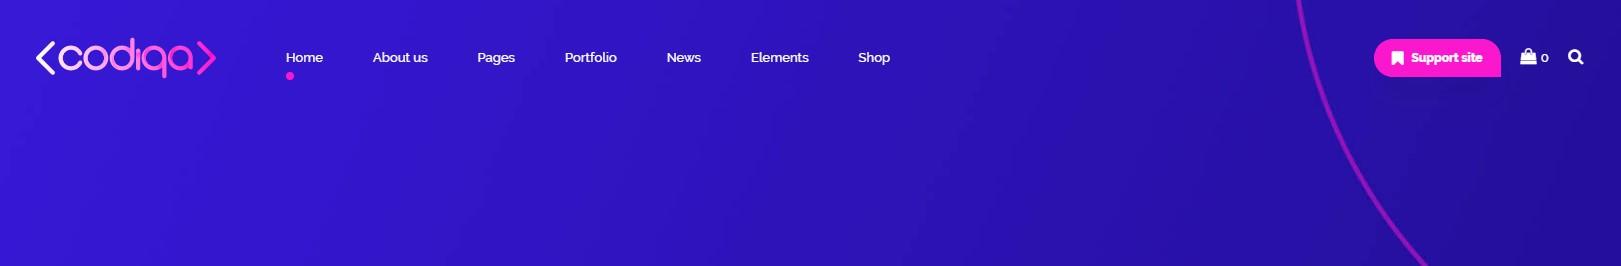 https://documentation.bold-themes.com/codiqa/wp-content/uploads/sites/49/2019/10/below-menu-true.jpg